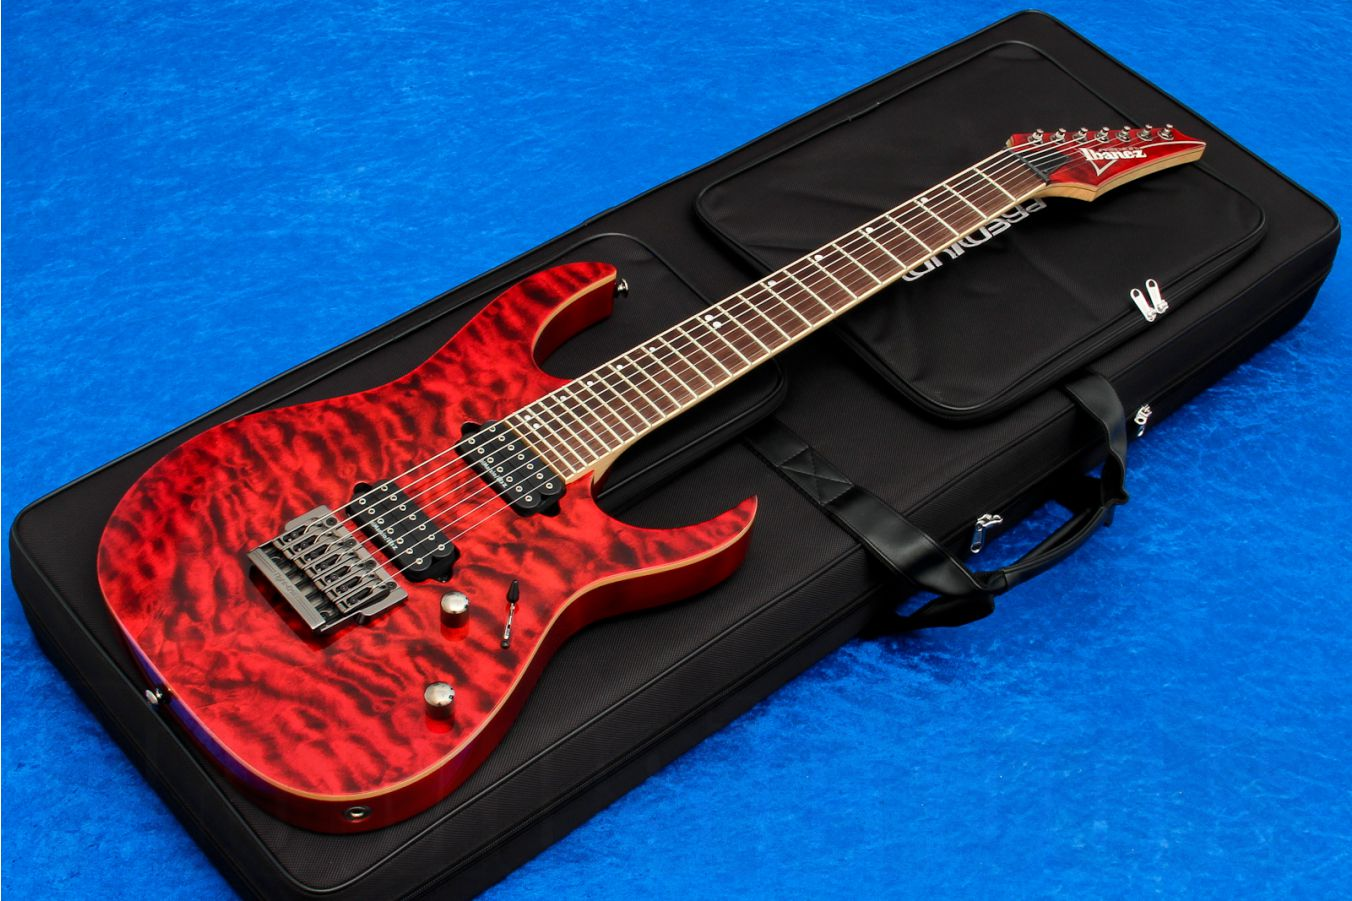 Ibanez RG927FXQM RDT Premium - Red Desert - demo